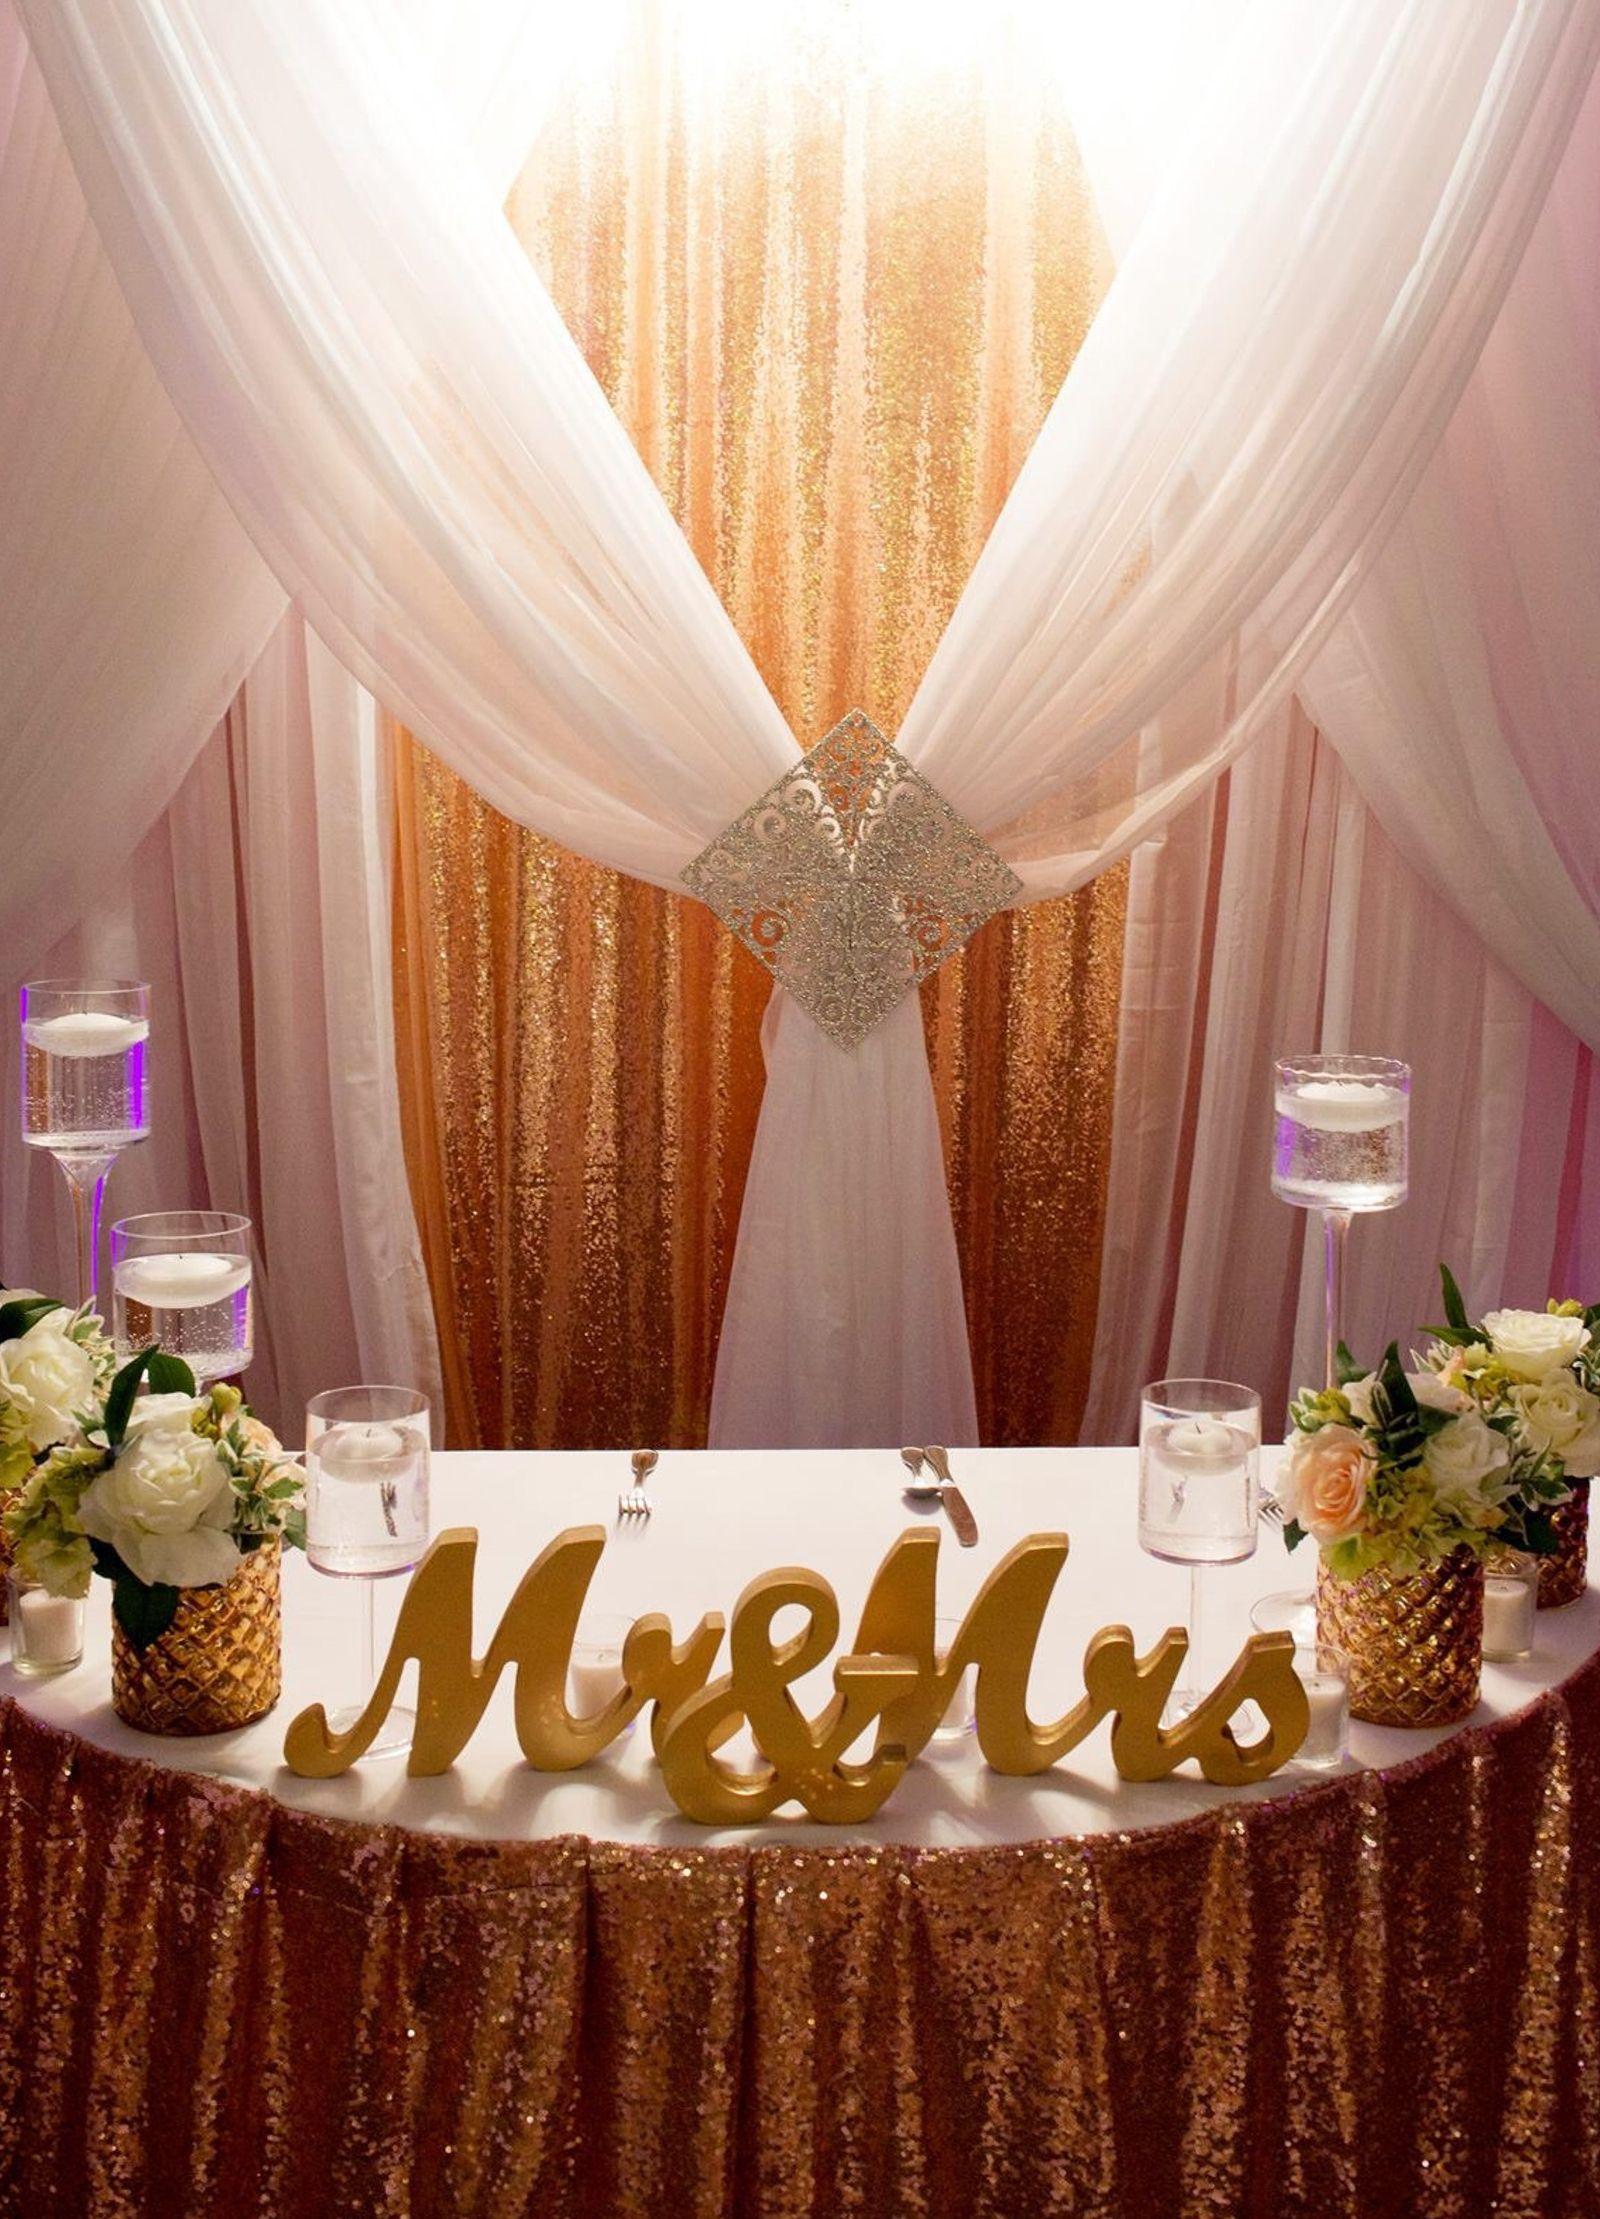 Mr  Mrs Wedding Table Signs  Wedding Decor  Photo Props